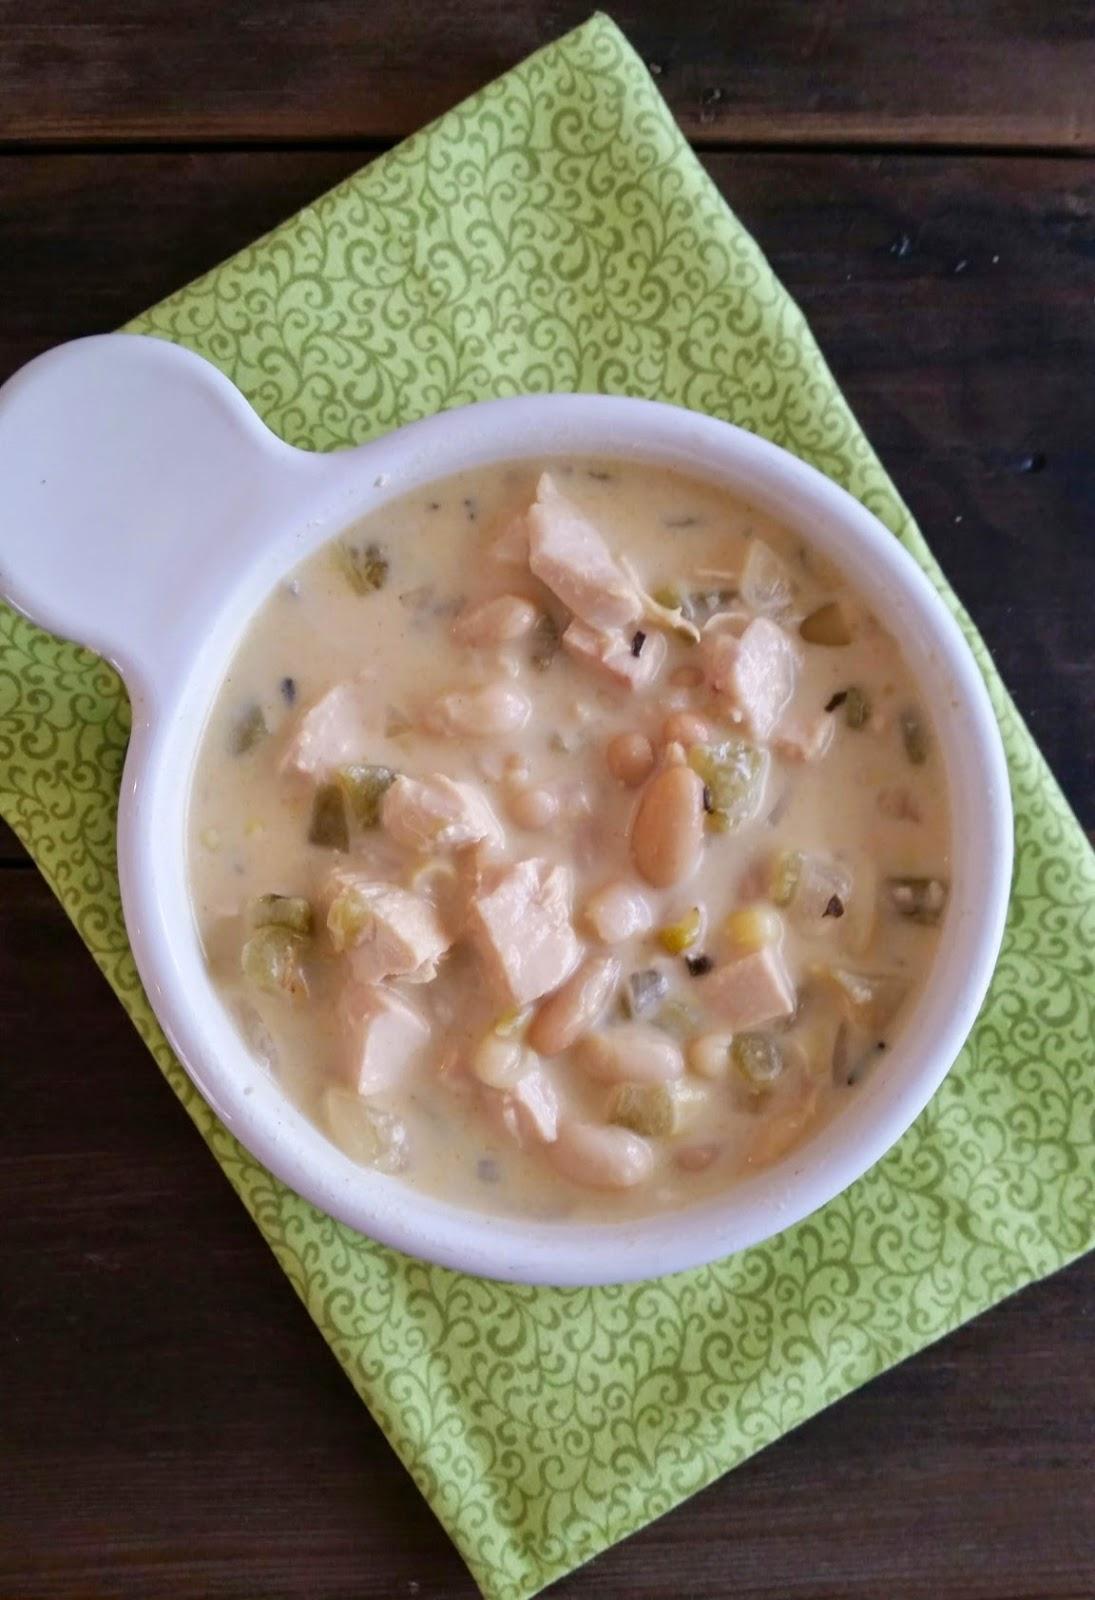 White Chicken Chili Recipe from Three Kids and a Fish